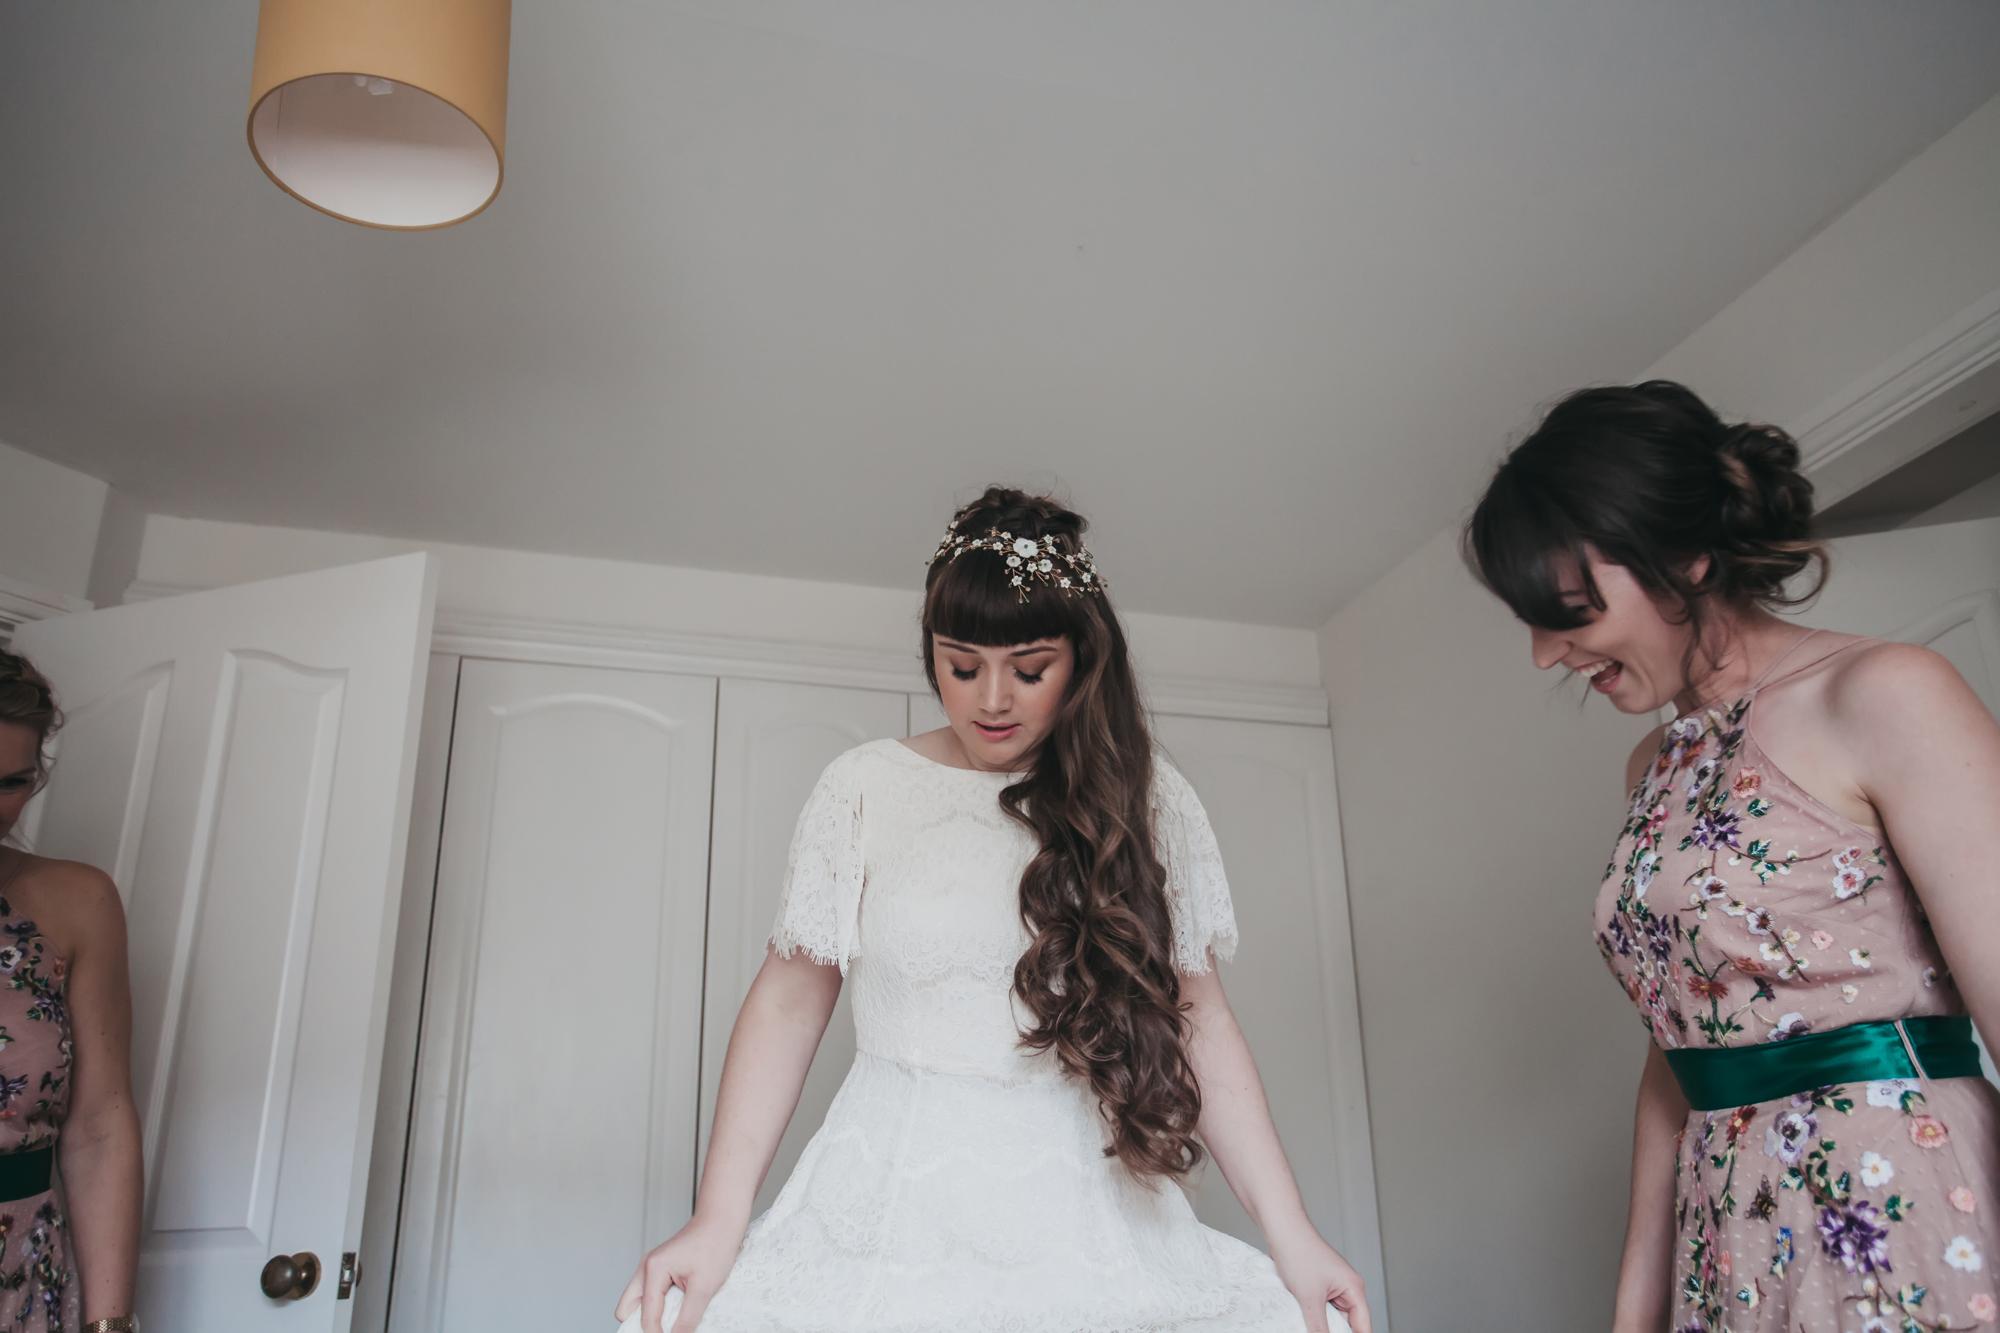 Kristy-Back-Garden-Outdoor-Wedding-Sheffield-Industrial-Warehouse-Wedding-Bohemian-Kate-Beaumont-Dahlia-Dress-2.jpg